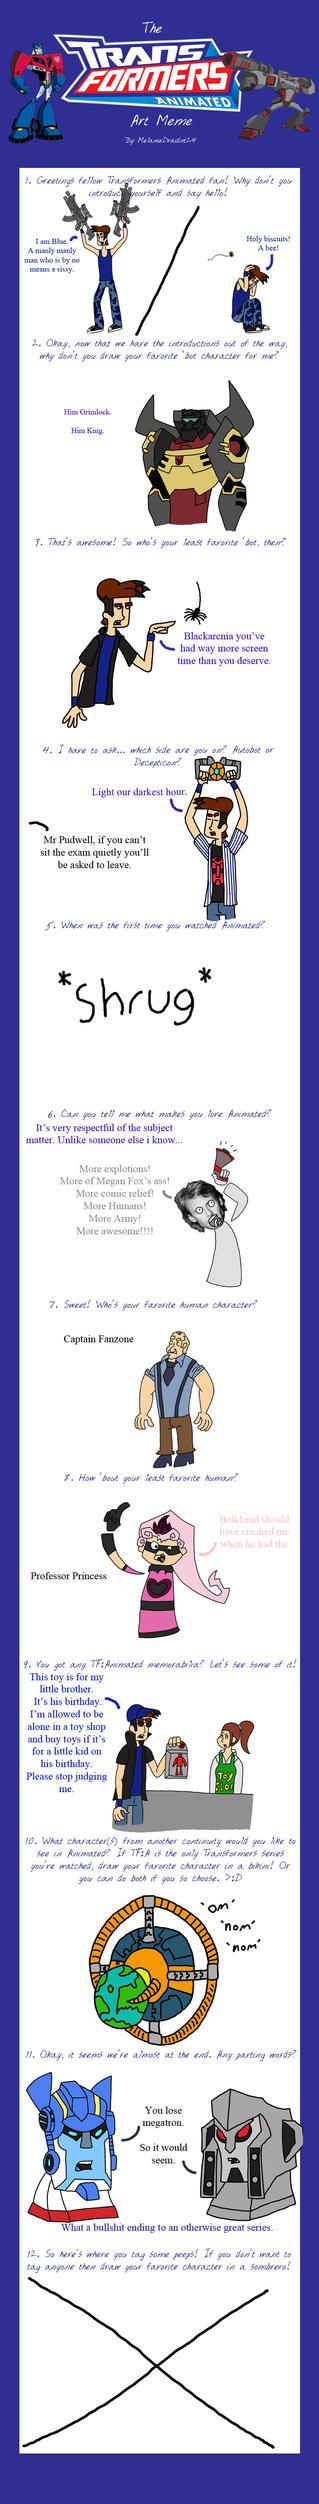 TF animated meme by purple-samurai